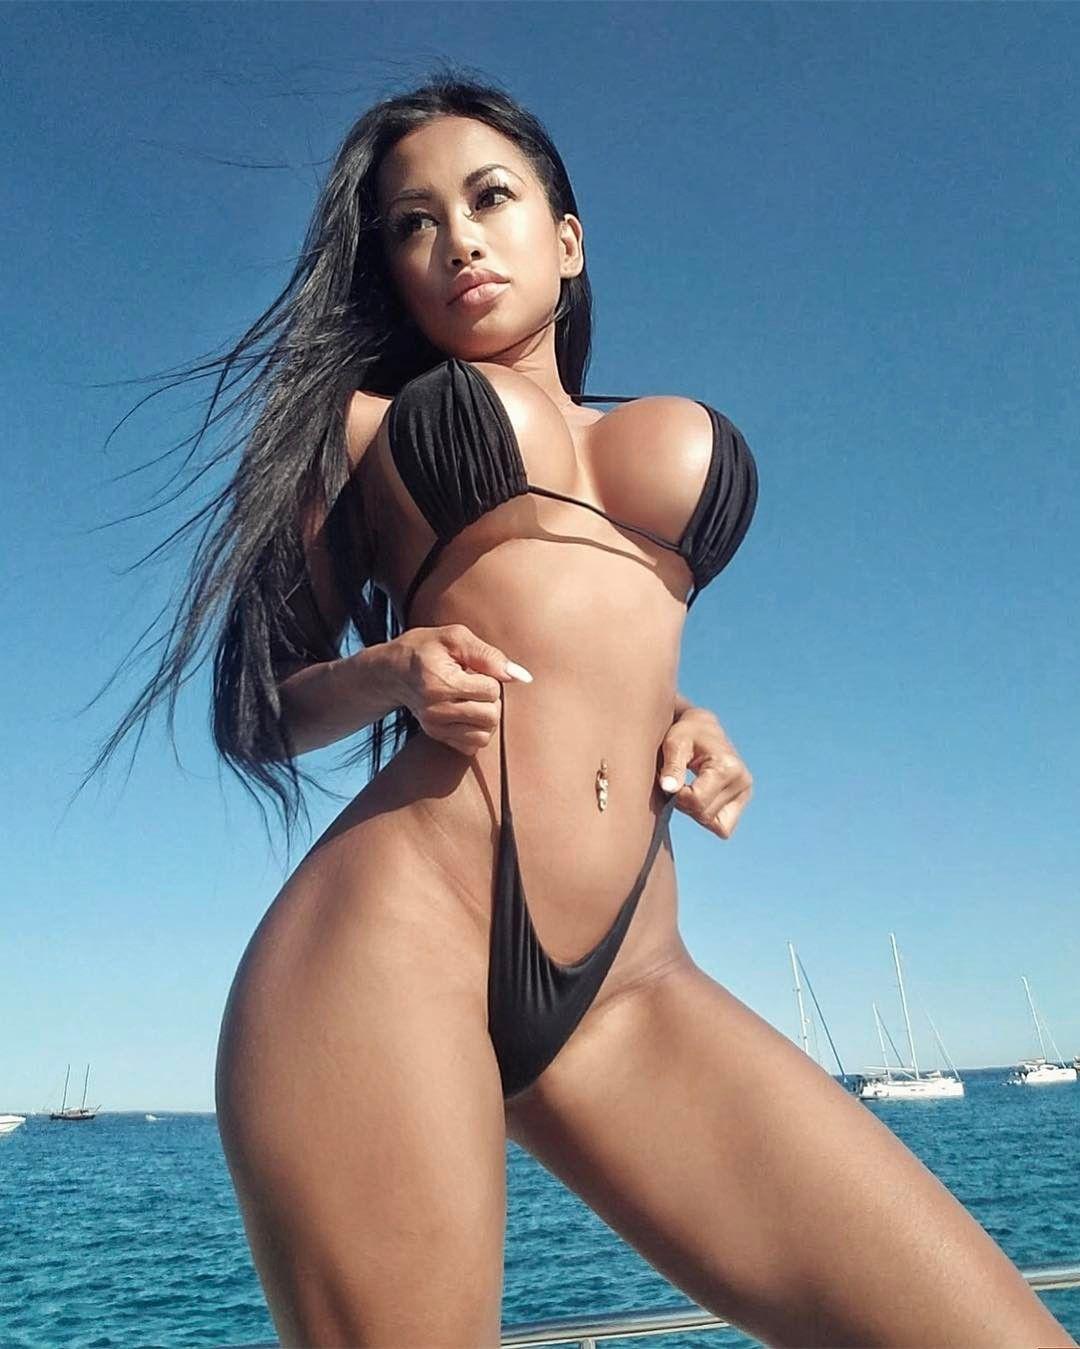 Danielle fishel sexy naked pics